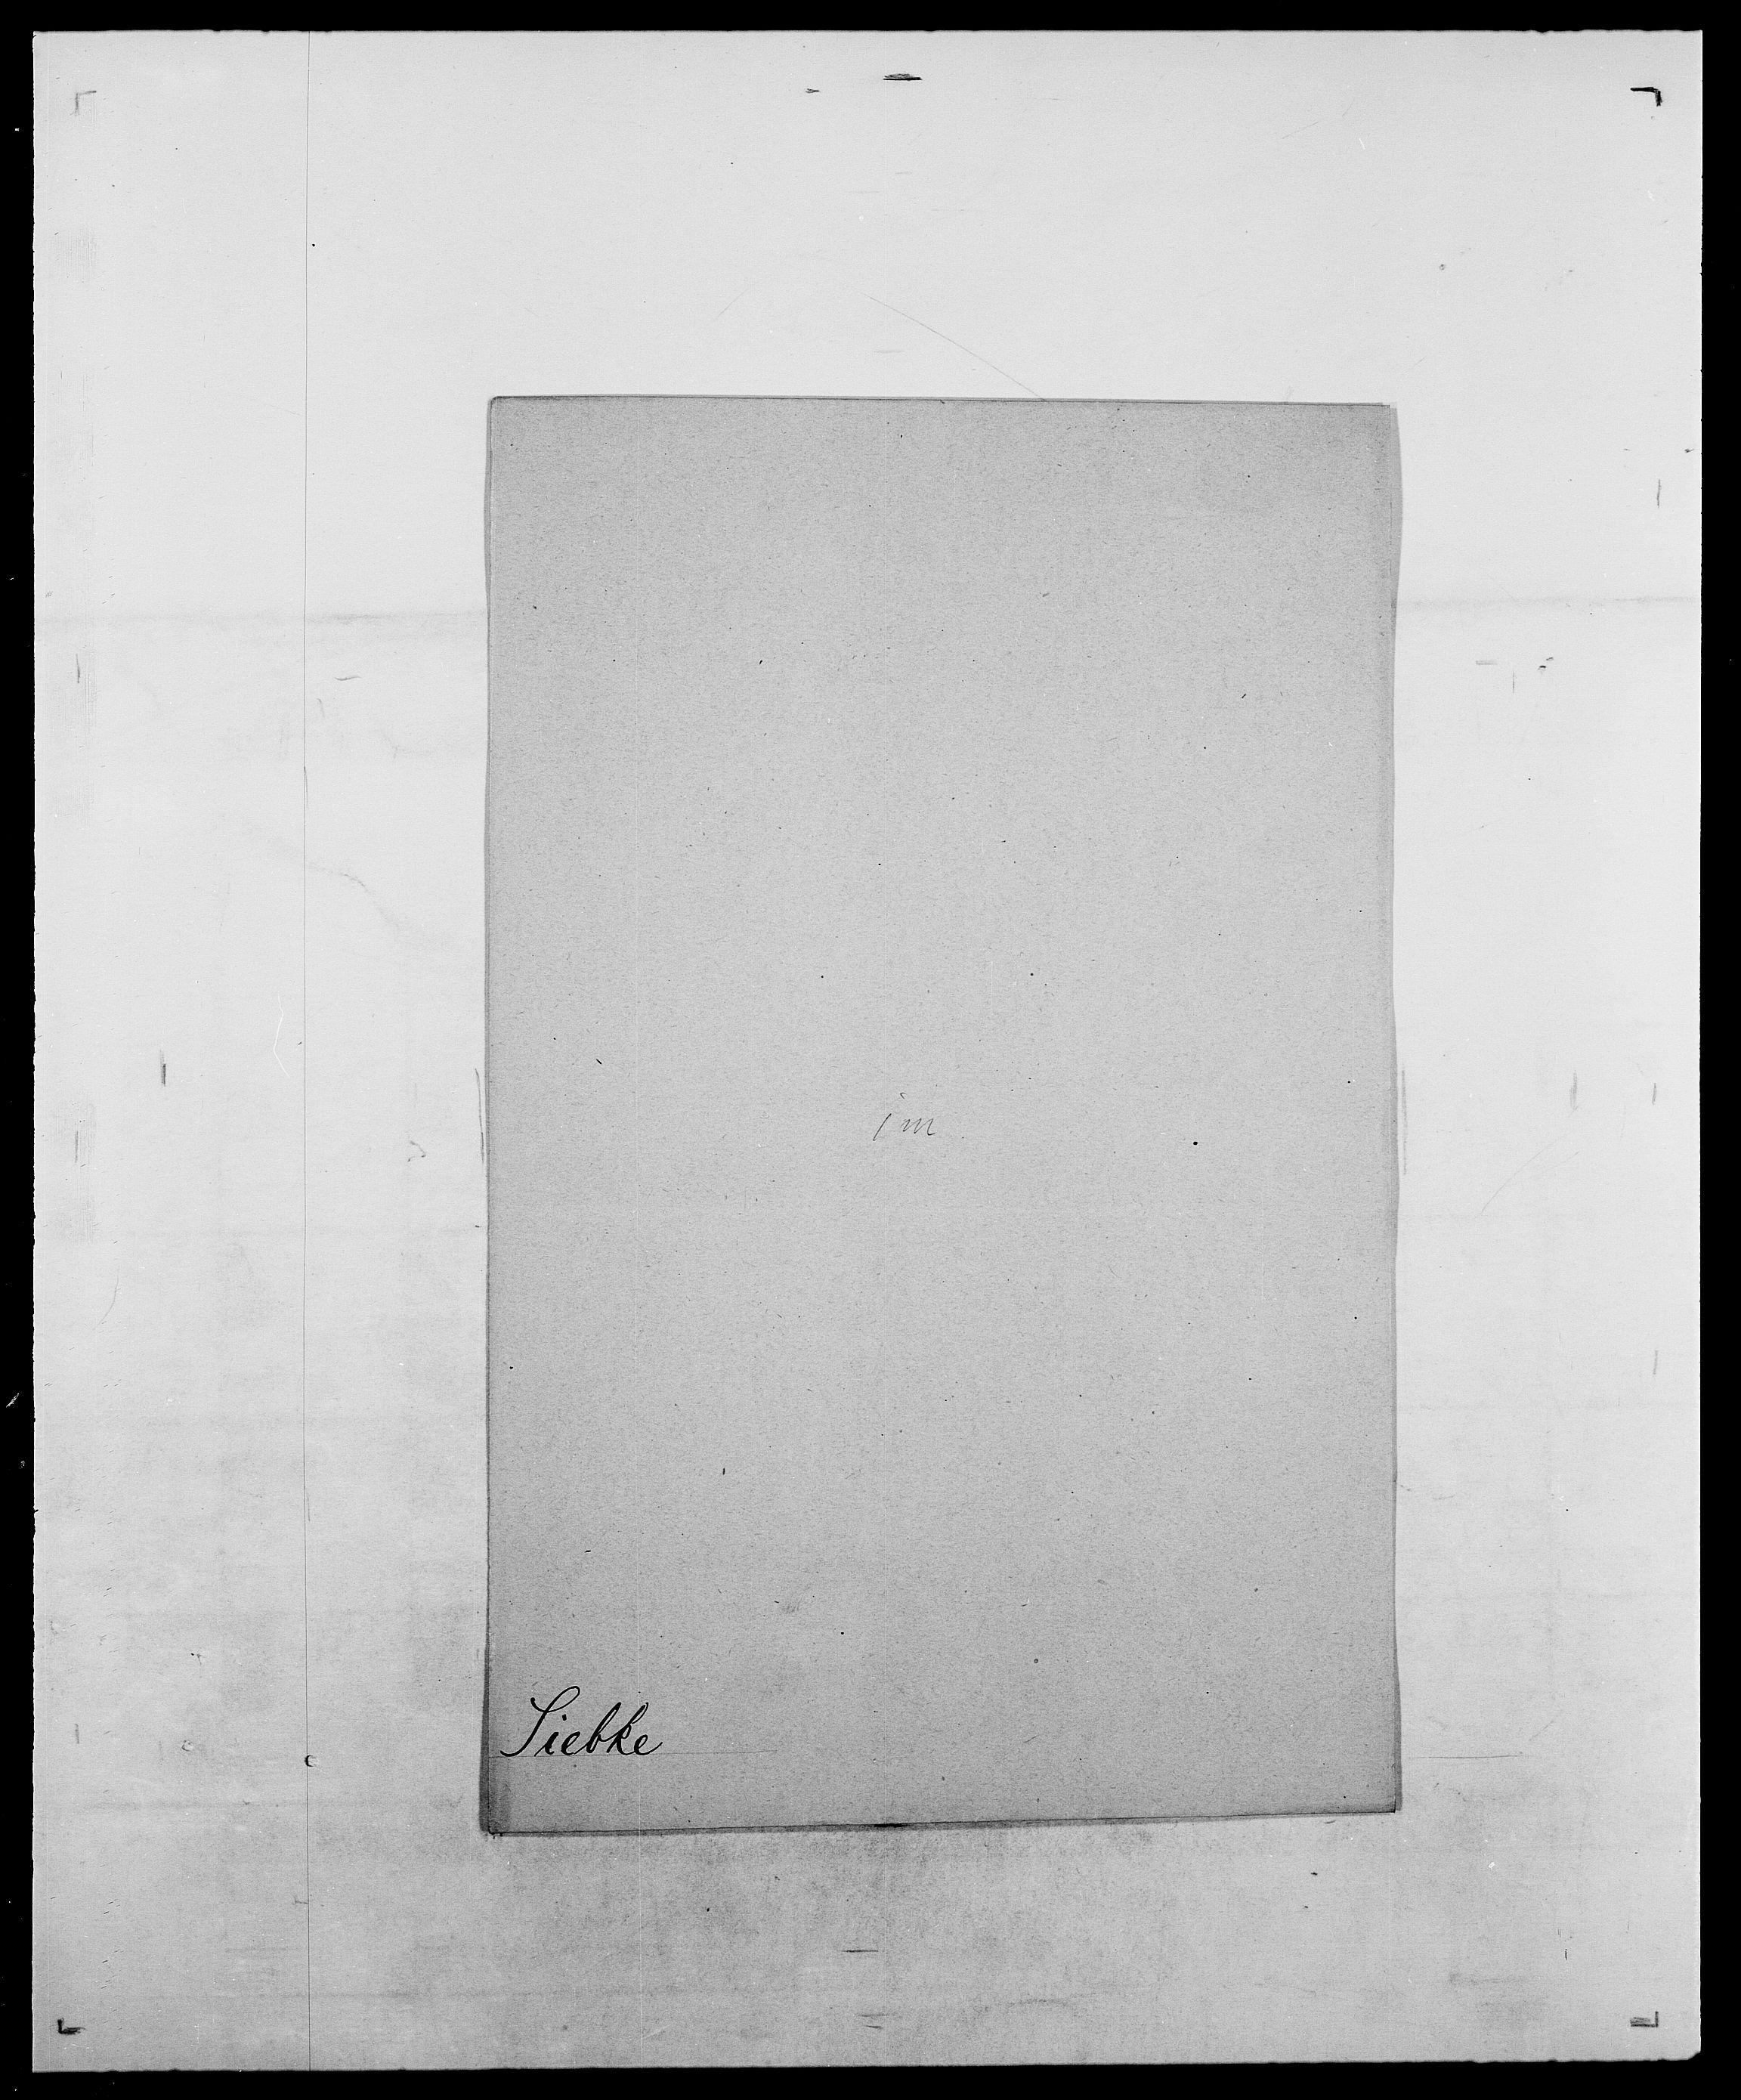 SAO, Delgobe, Charles Antoine - samling, D/Da/L0035: Schnabel - sjetman, s. 763